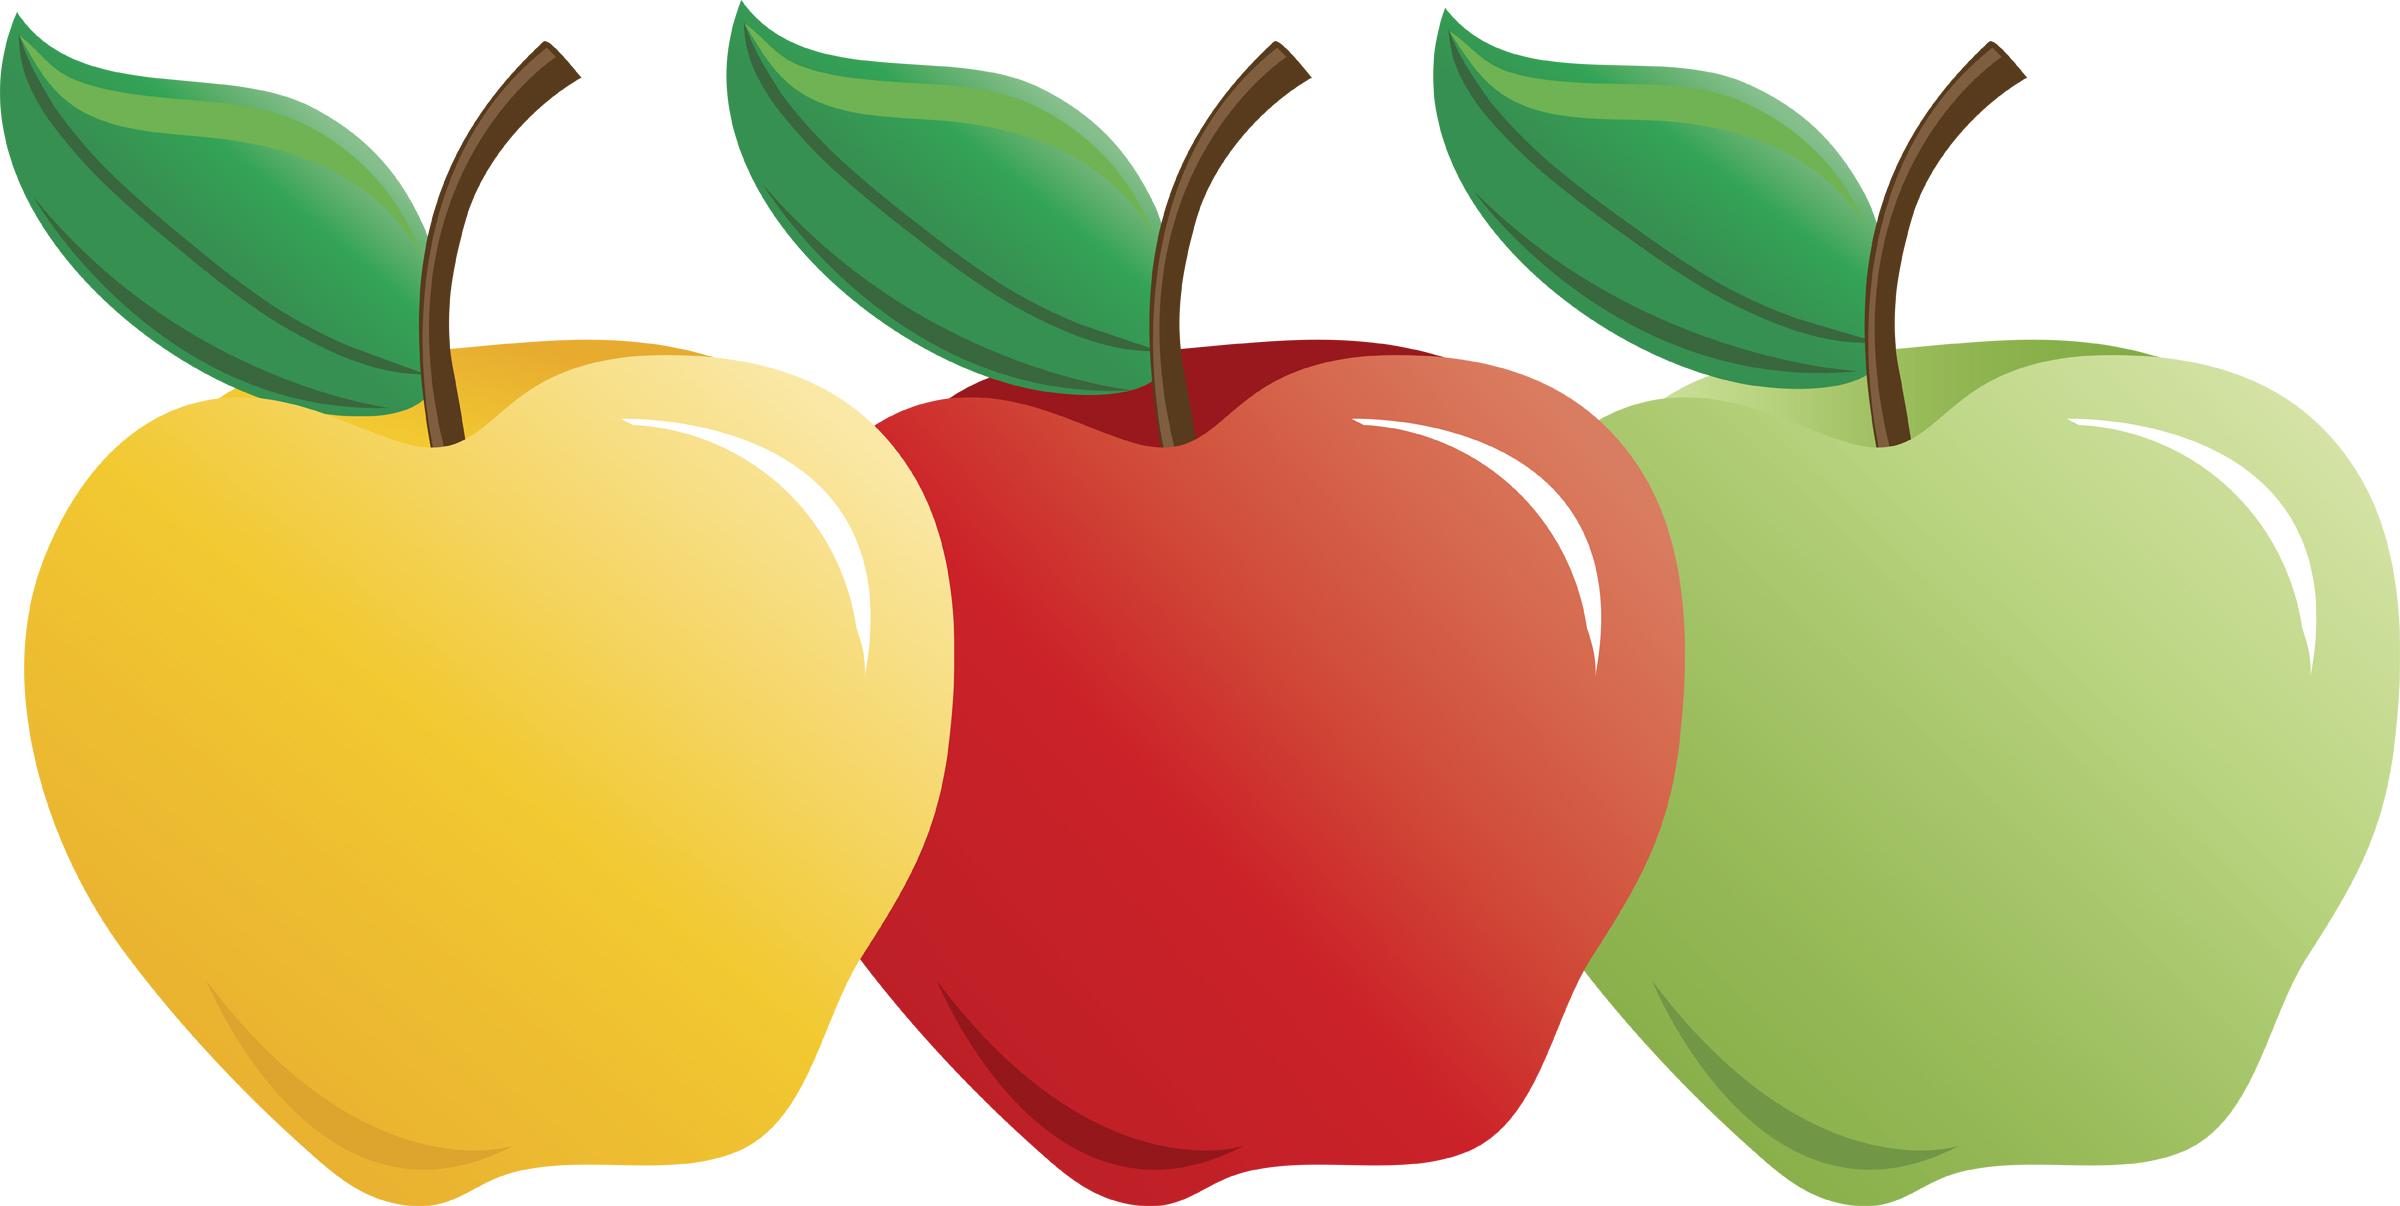 2400x1206 Apple Clip Art Inderecami Drawing